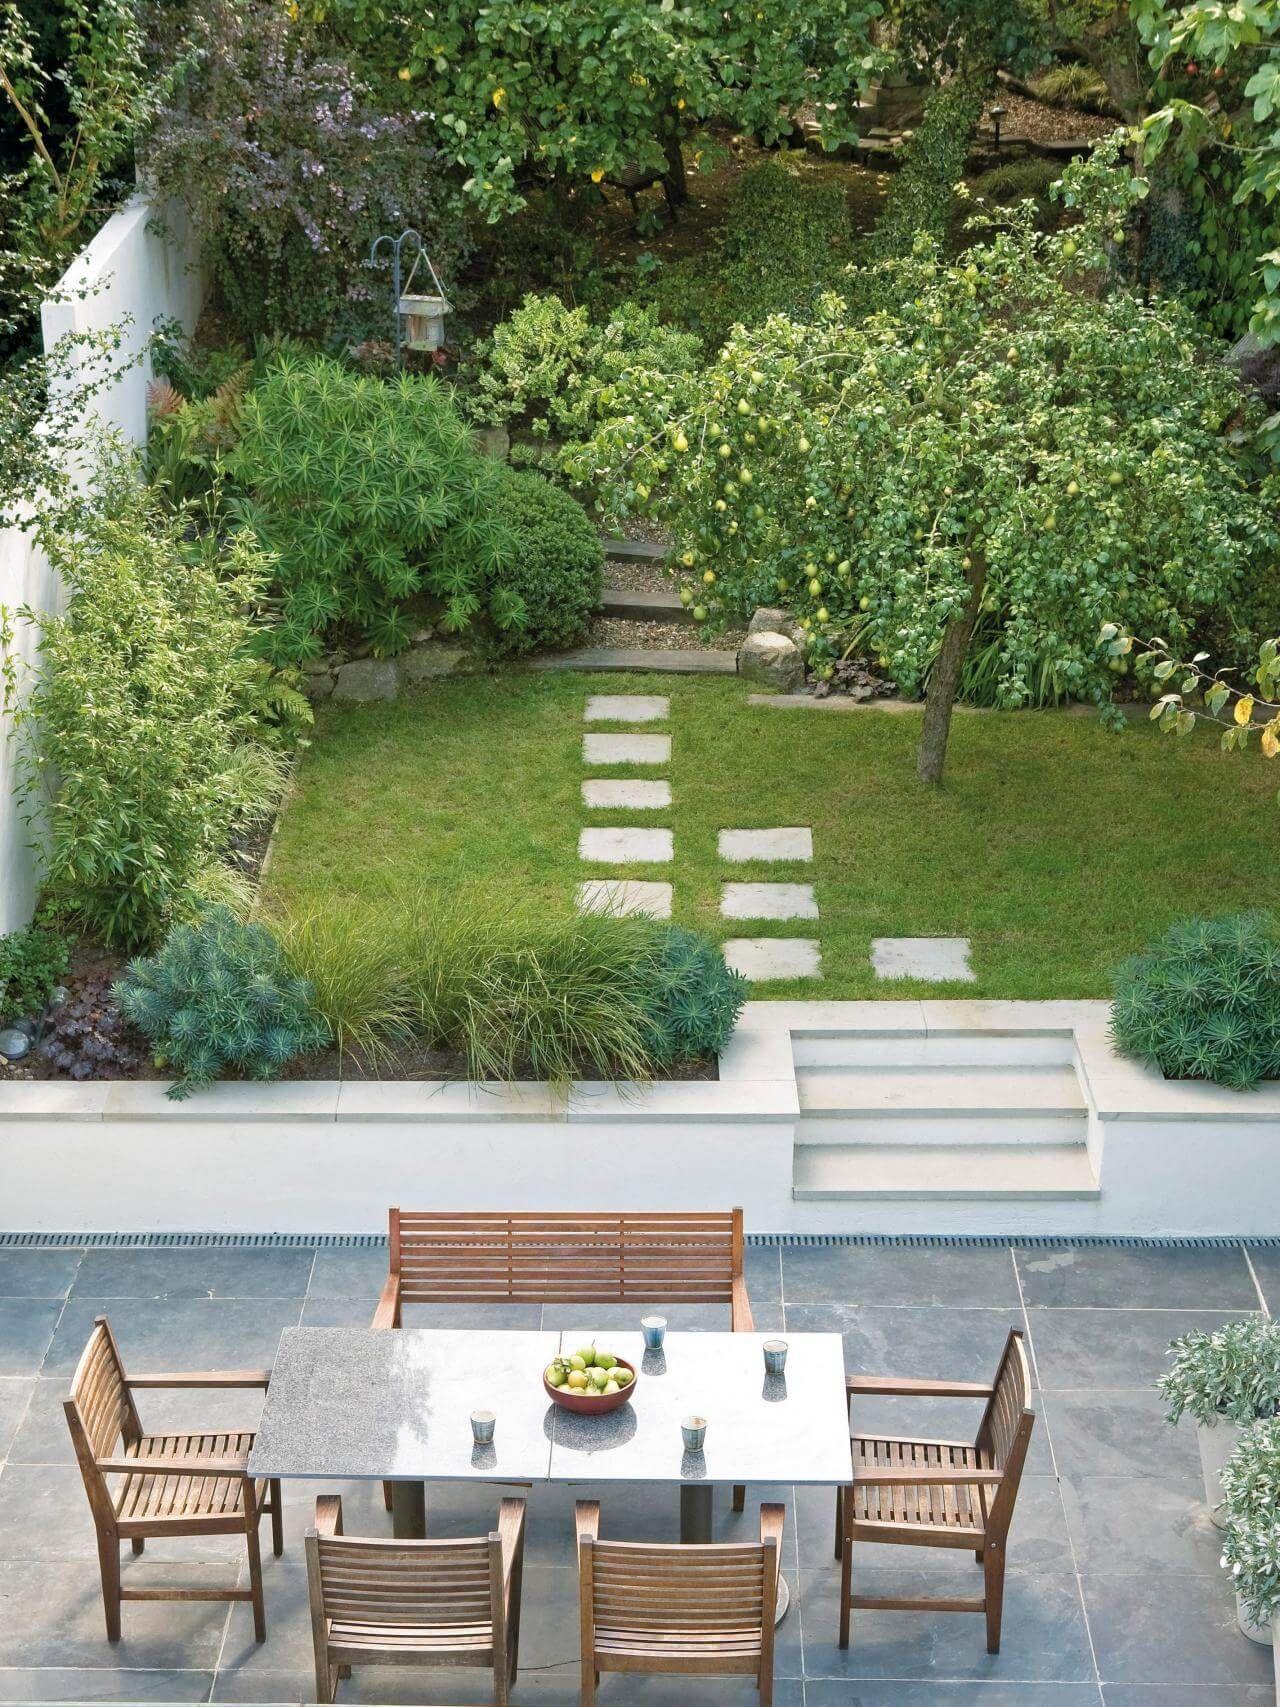 41 Backyard Design Ideas For Small Yards Backyards Design And Nice